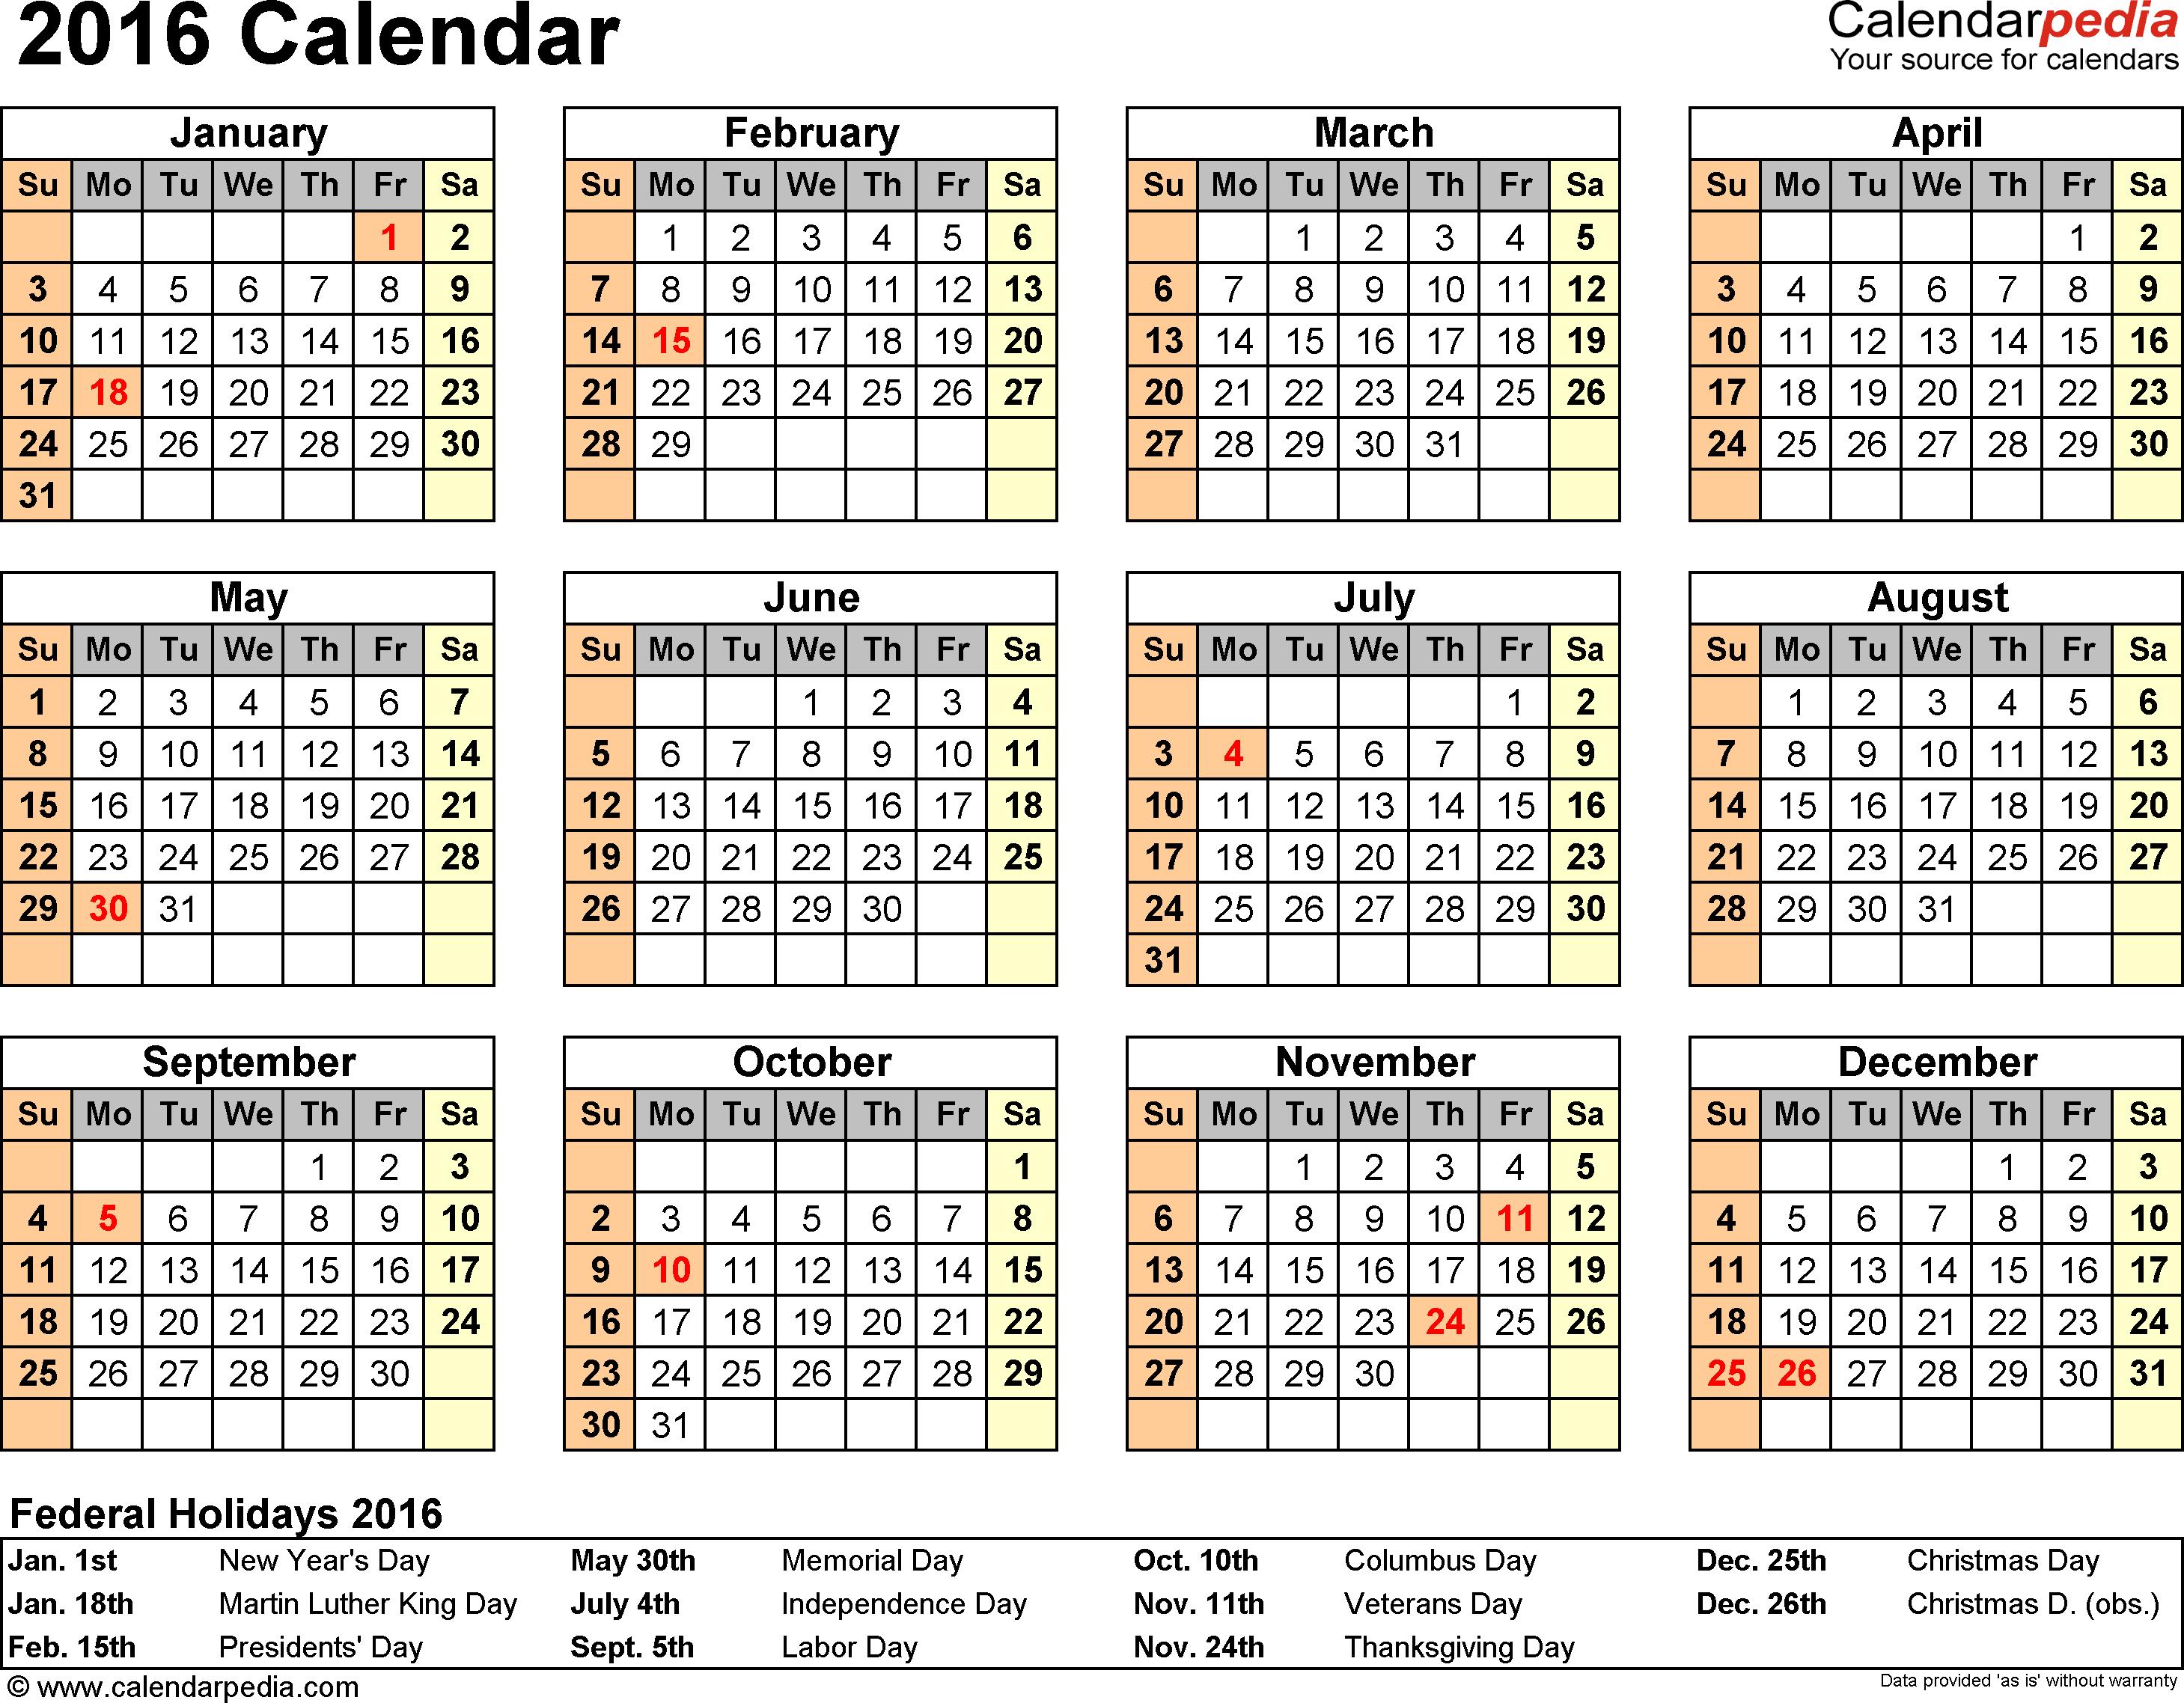 2016 Calendar 16 Free Printable Word Calendar Templates 2016